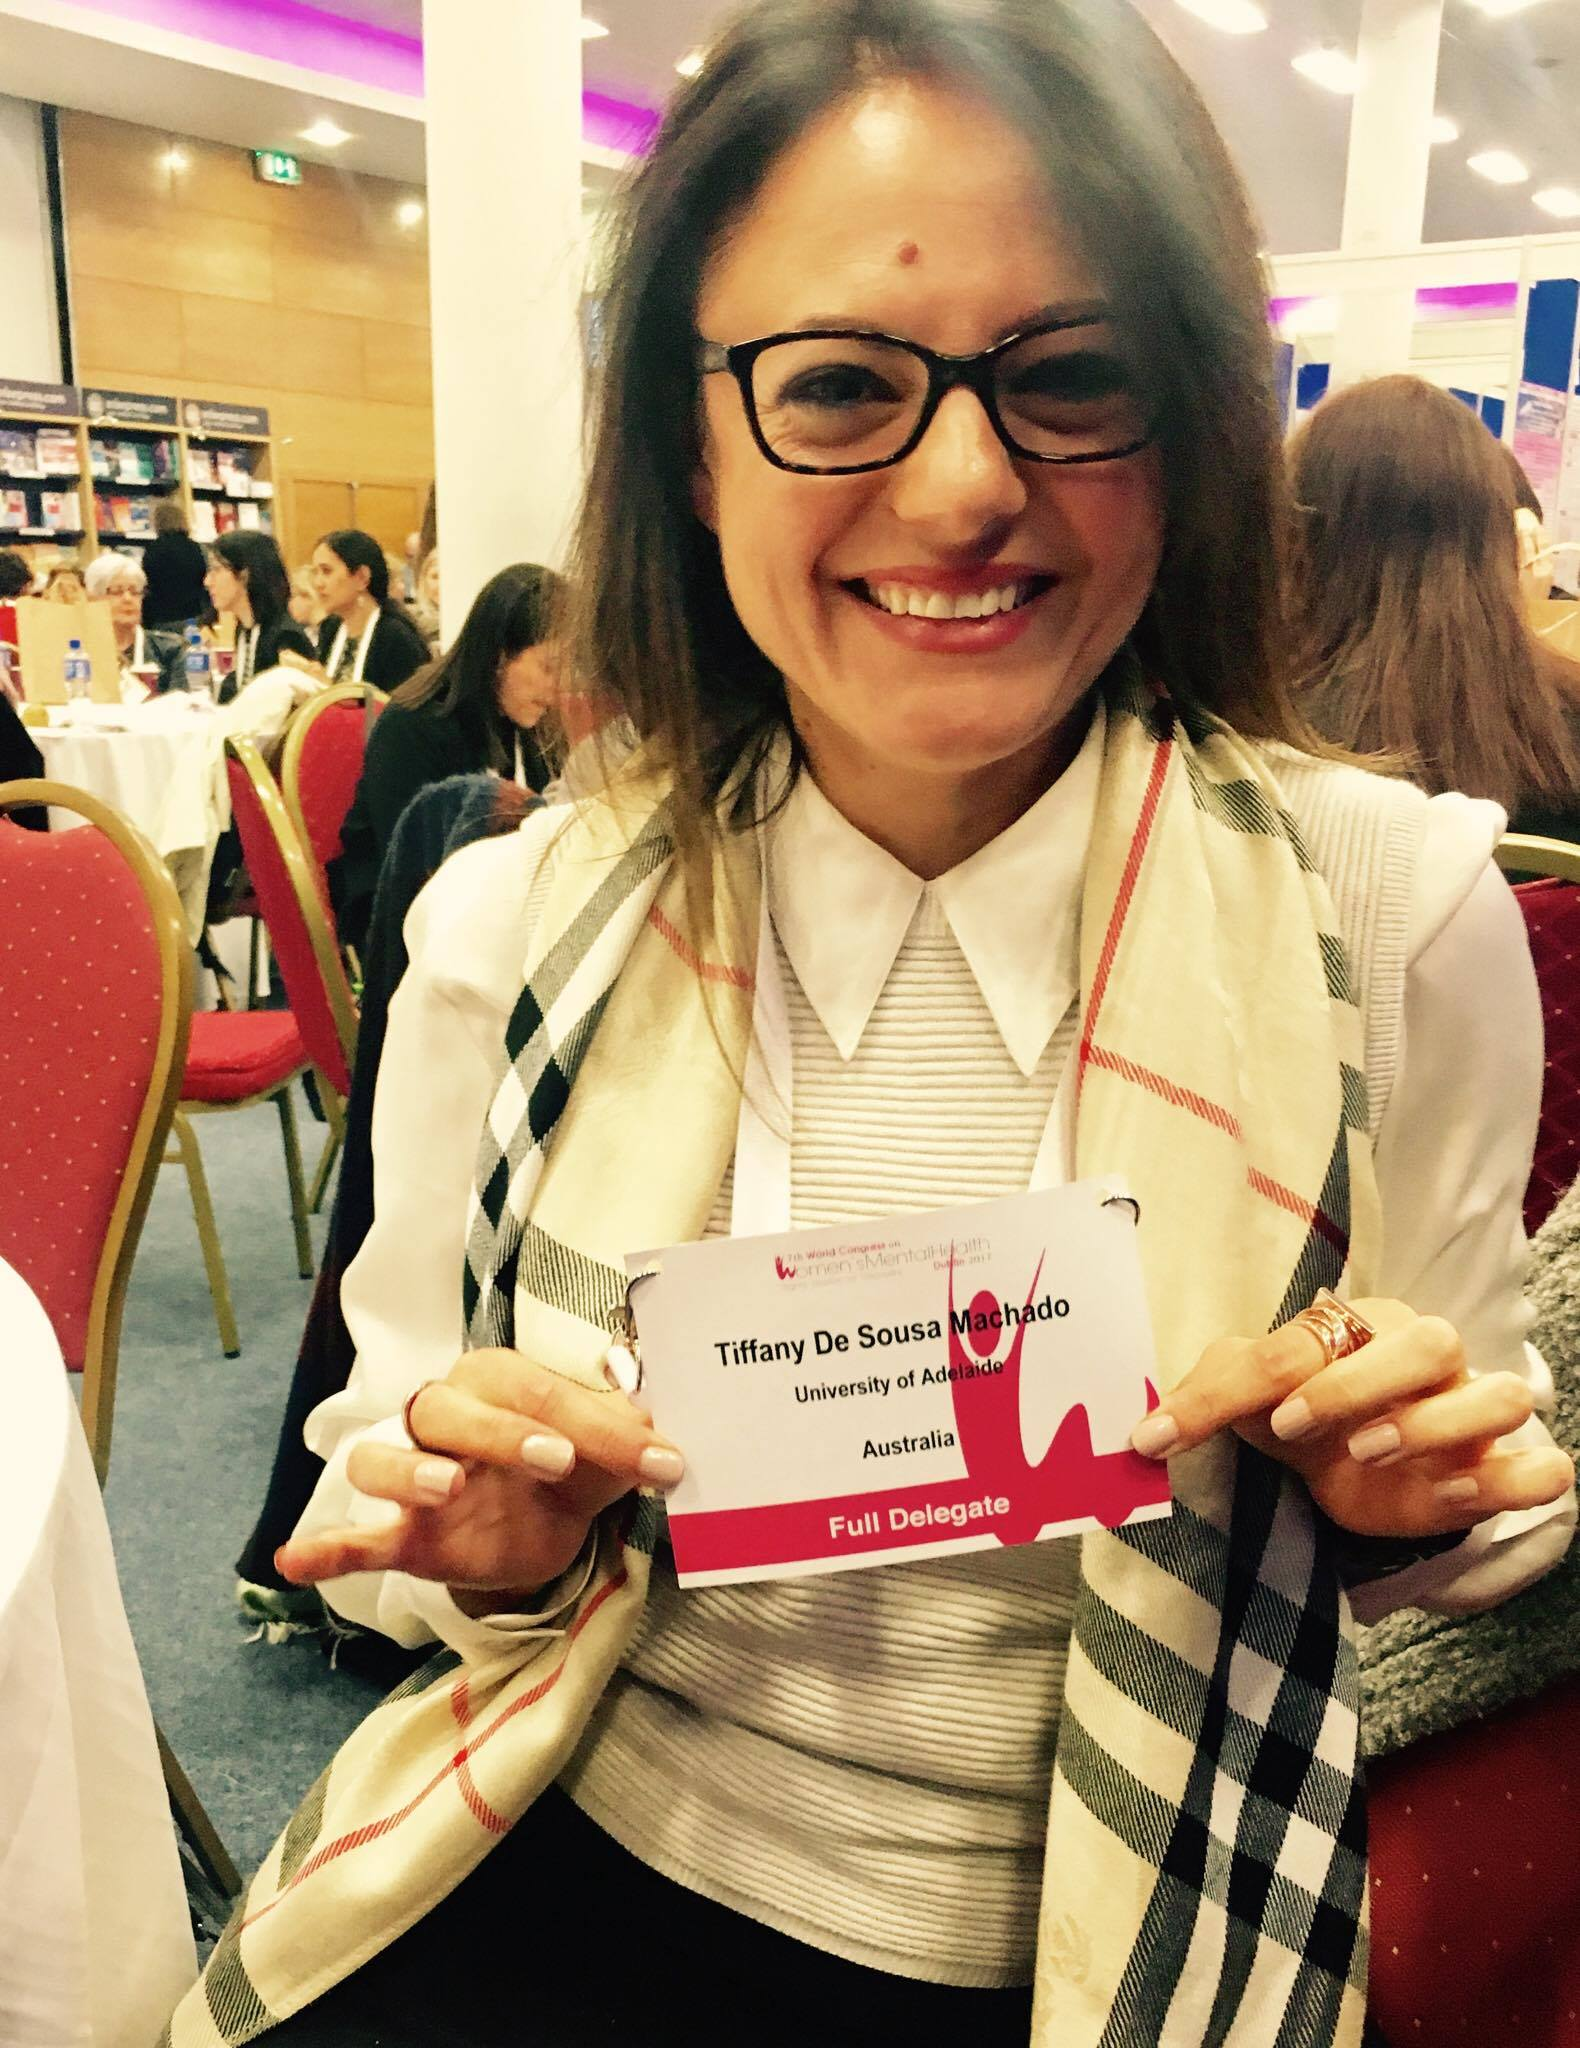 At the 7th world congress on women's mental health, Dublin, Ireland.